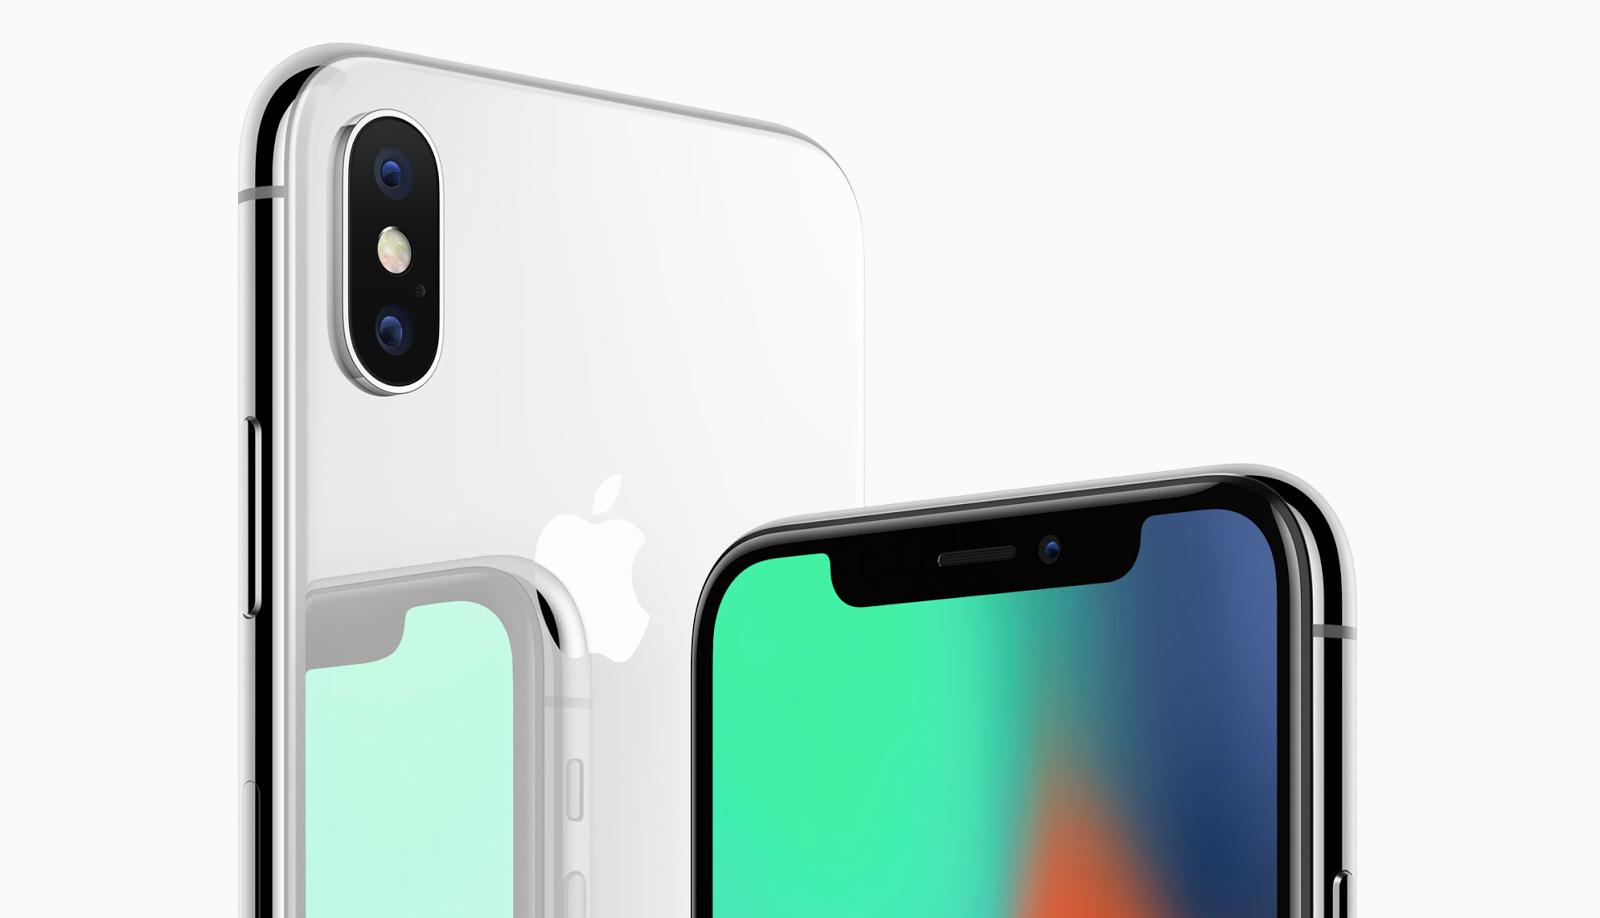 Бой между лидерами рынка сравнение Apple iPhone X vs Samsung Galaxy Note 8 - камеры iPhone x